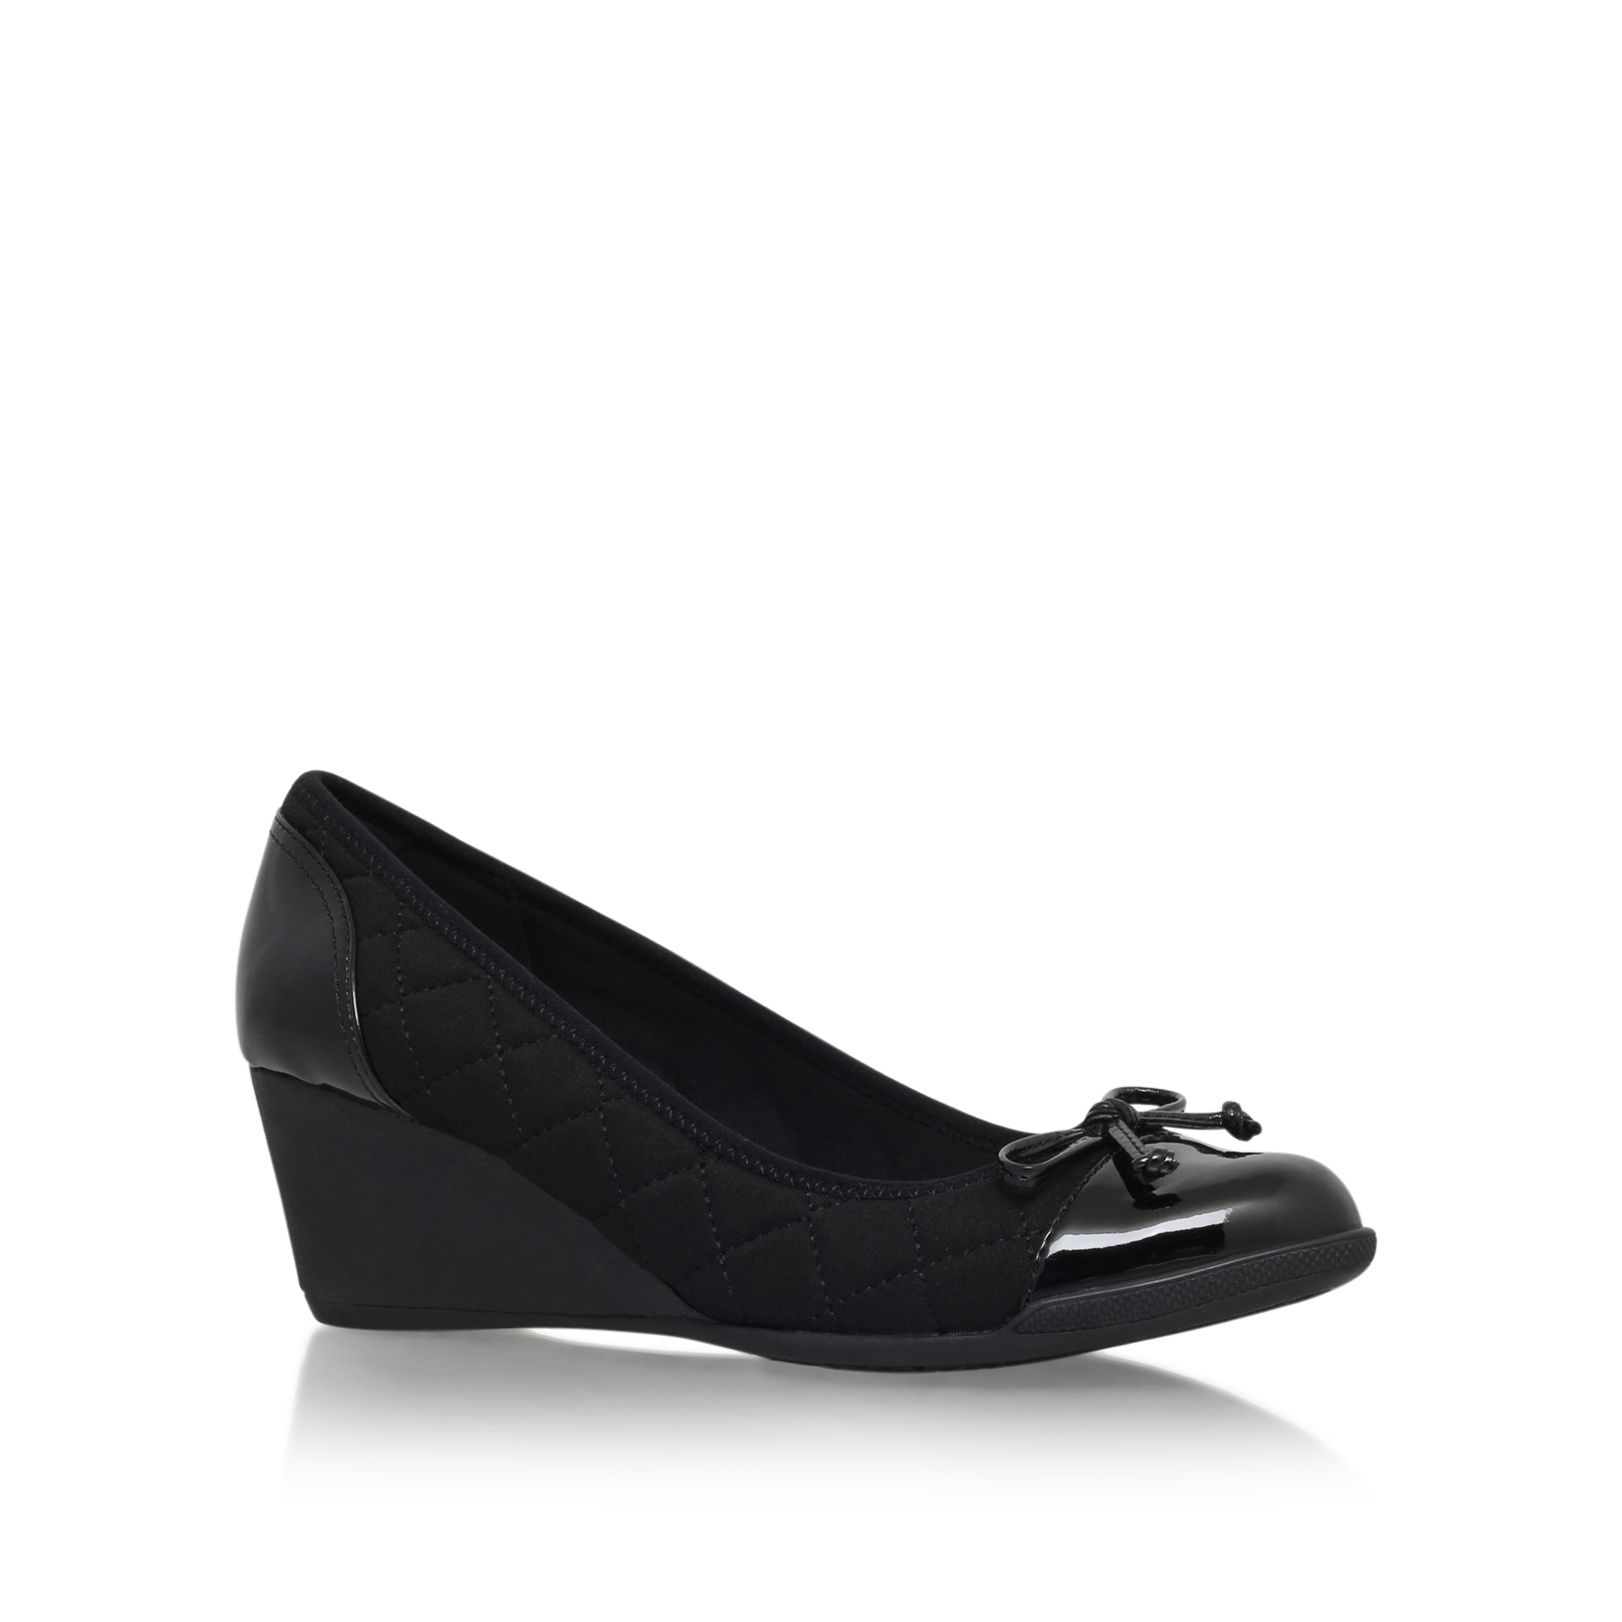 klein tallula2 low wedge heel court shoes in black lyst